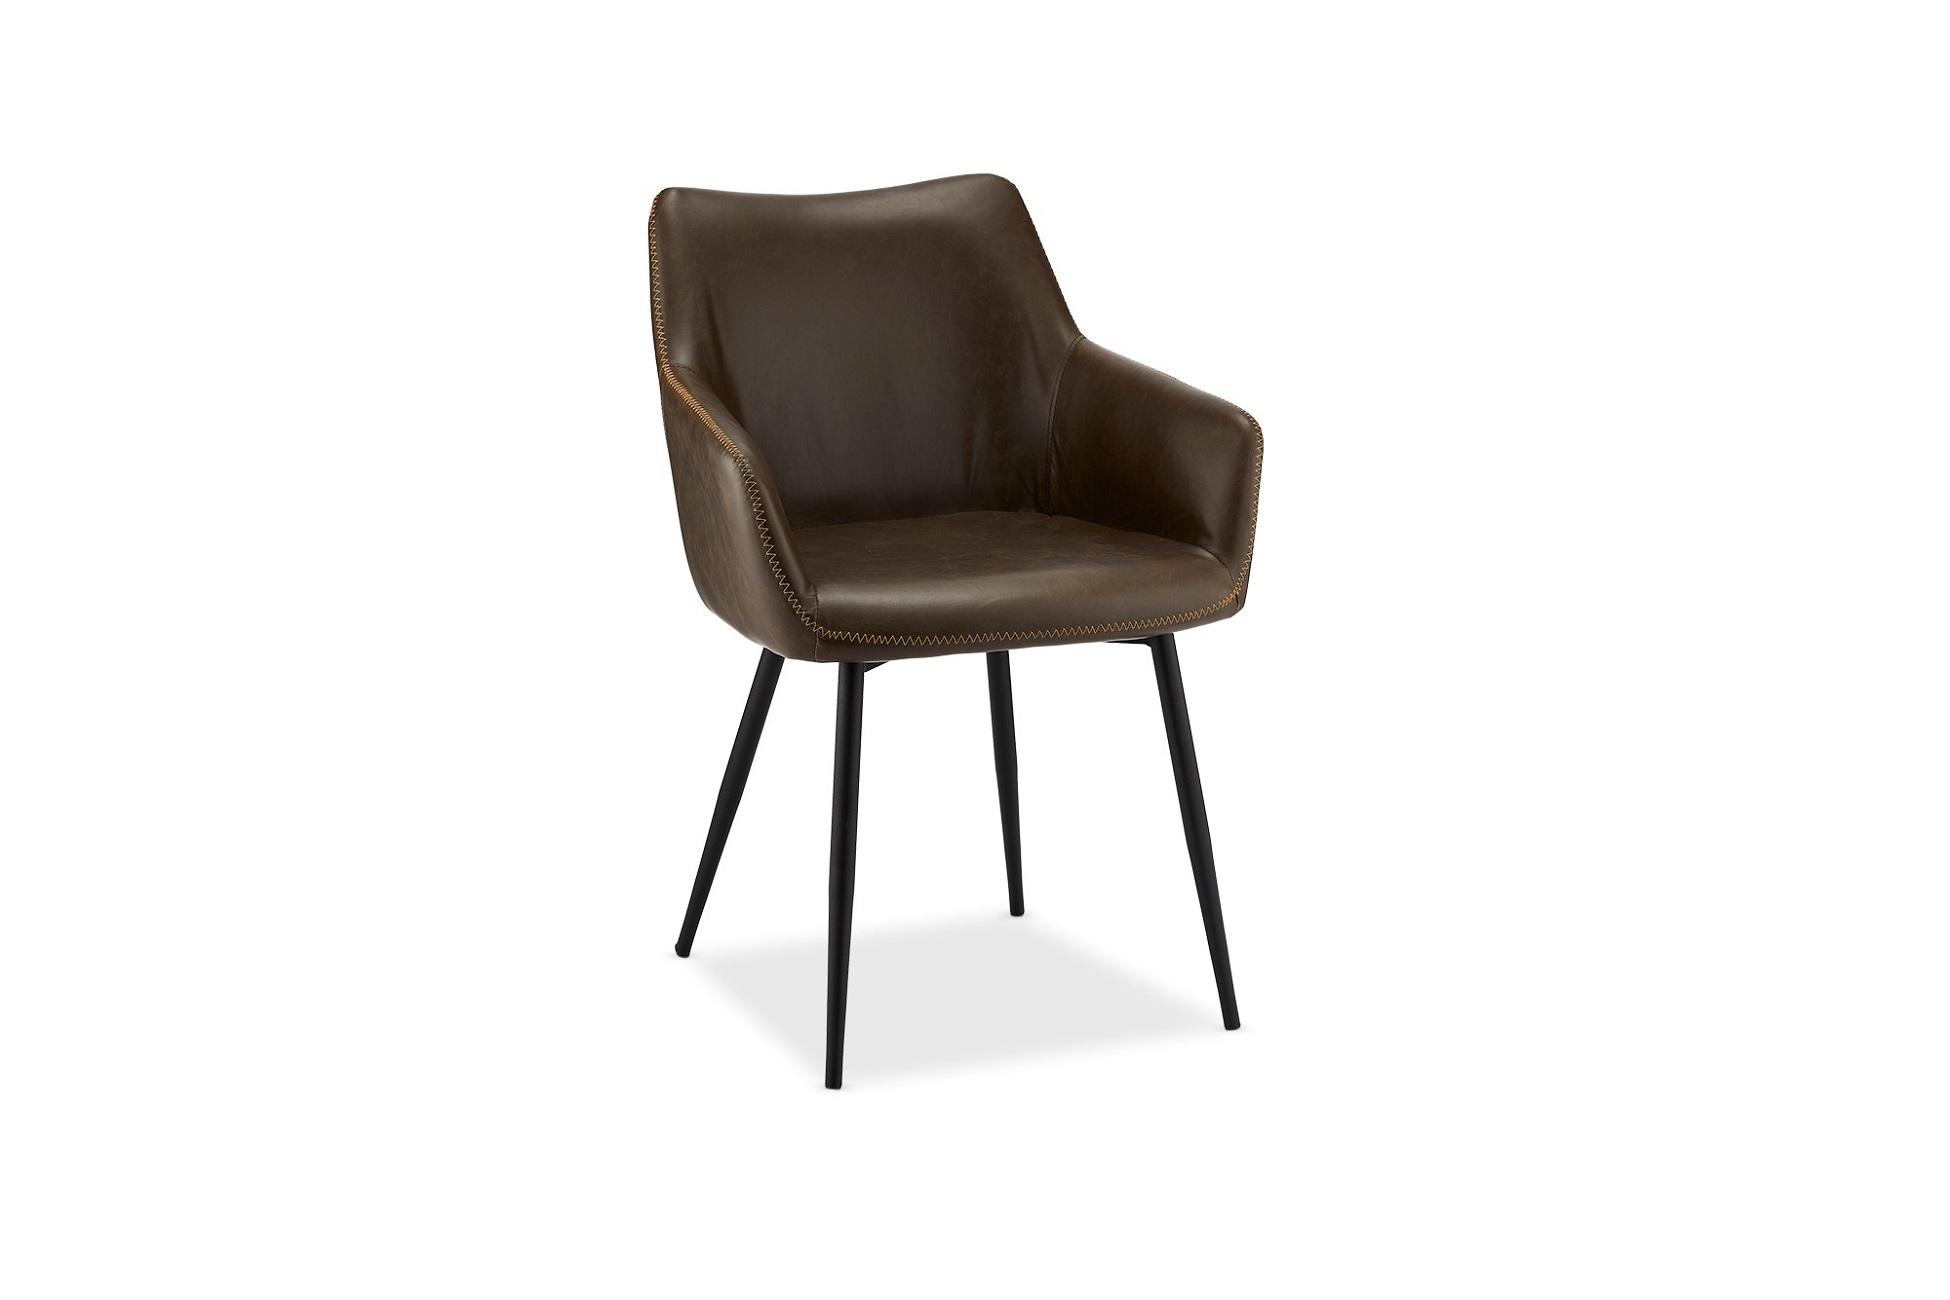 Elegantní židle Abacus, tmavohnědá - II. třída